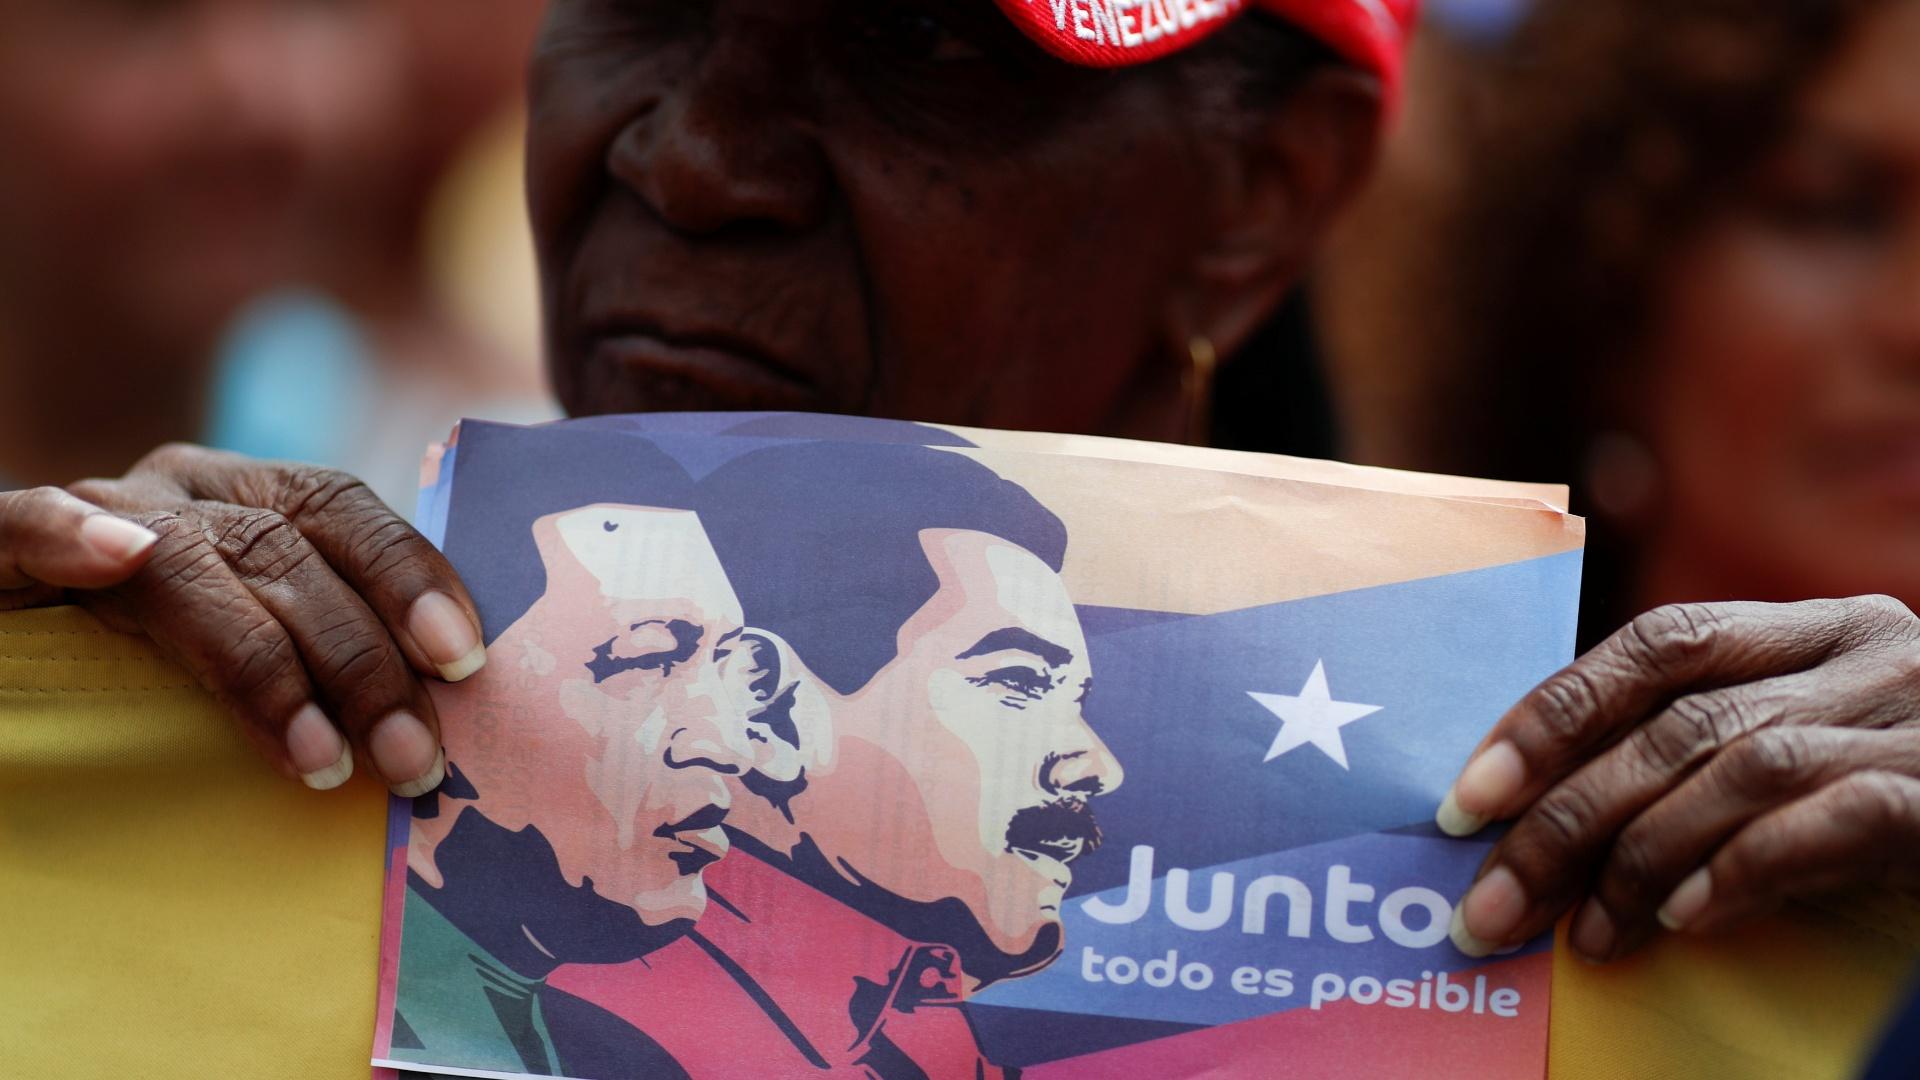 Carlos Garcia Rawlins /Reuters